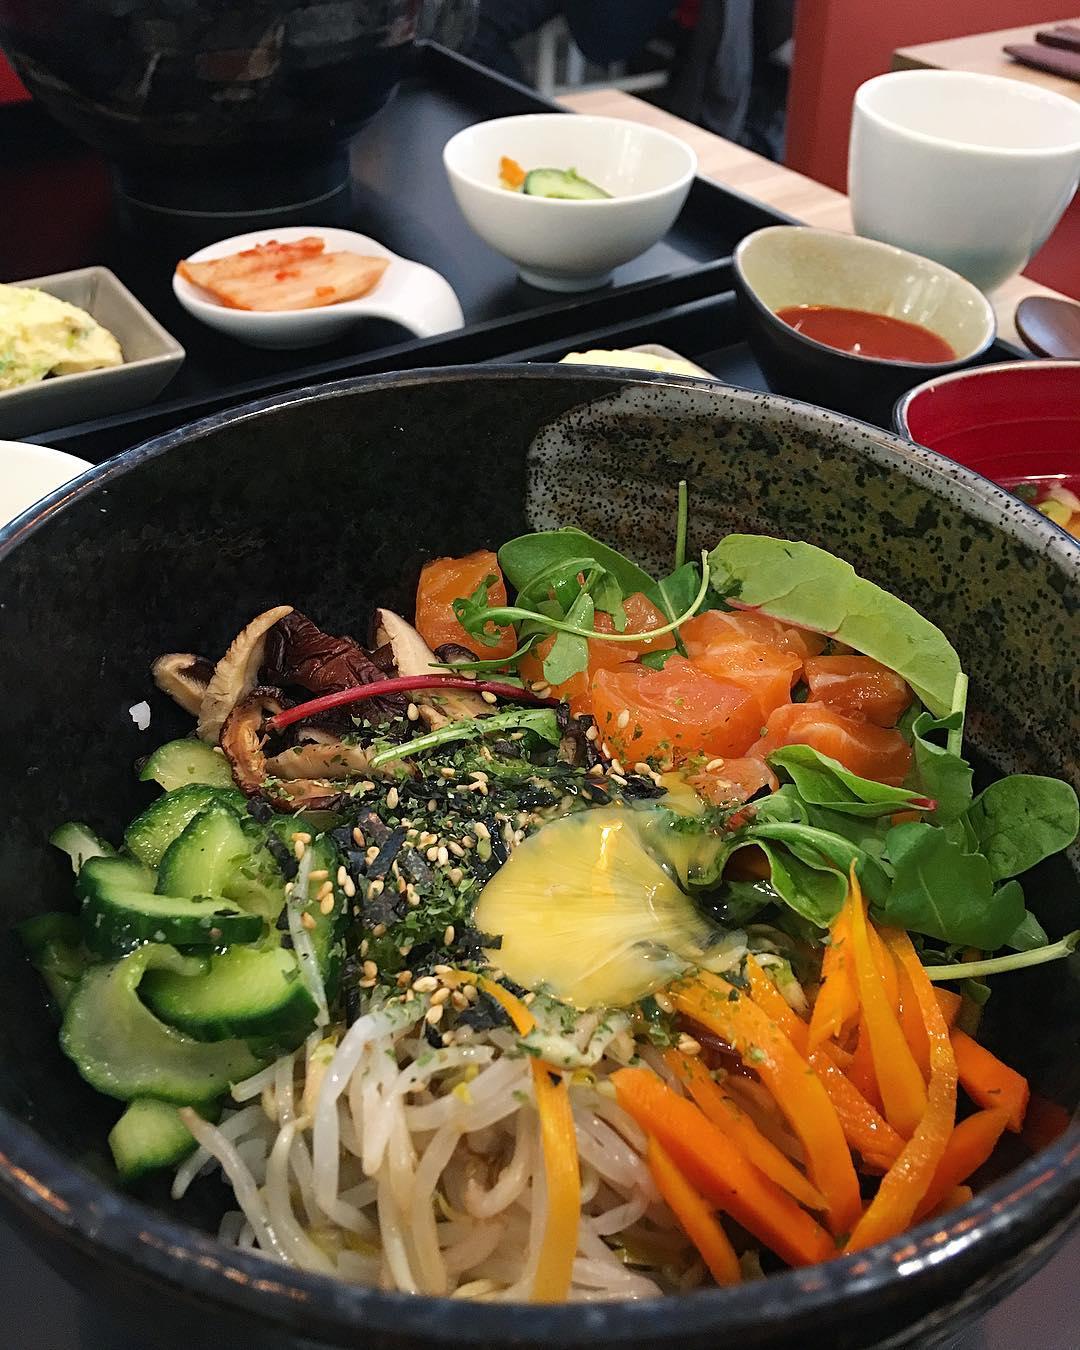 Dej' entre cOpines chez UMAMI ✌? BIBIMBAP forever ❤️ . . ➕ UMAMI • restaurant . ? Montpellier • rue Jean Jacques Rousseau . ______________  #umami #food #foodporn #foodlover #foodphotograpy #asianfood #coreanfood #bibimbap #montpellier #pintademontpellier #blogfood #foodblog #foodblogger #umamimtp #umamimontpellier